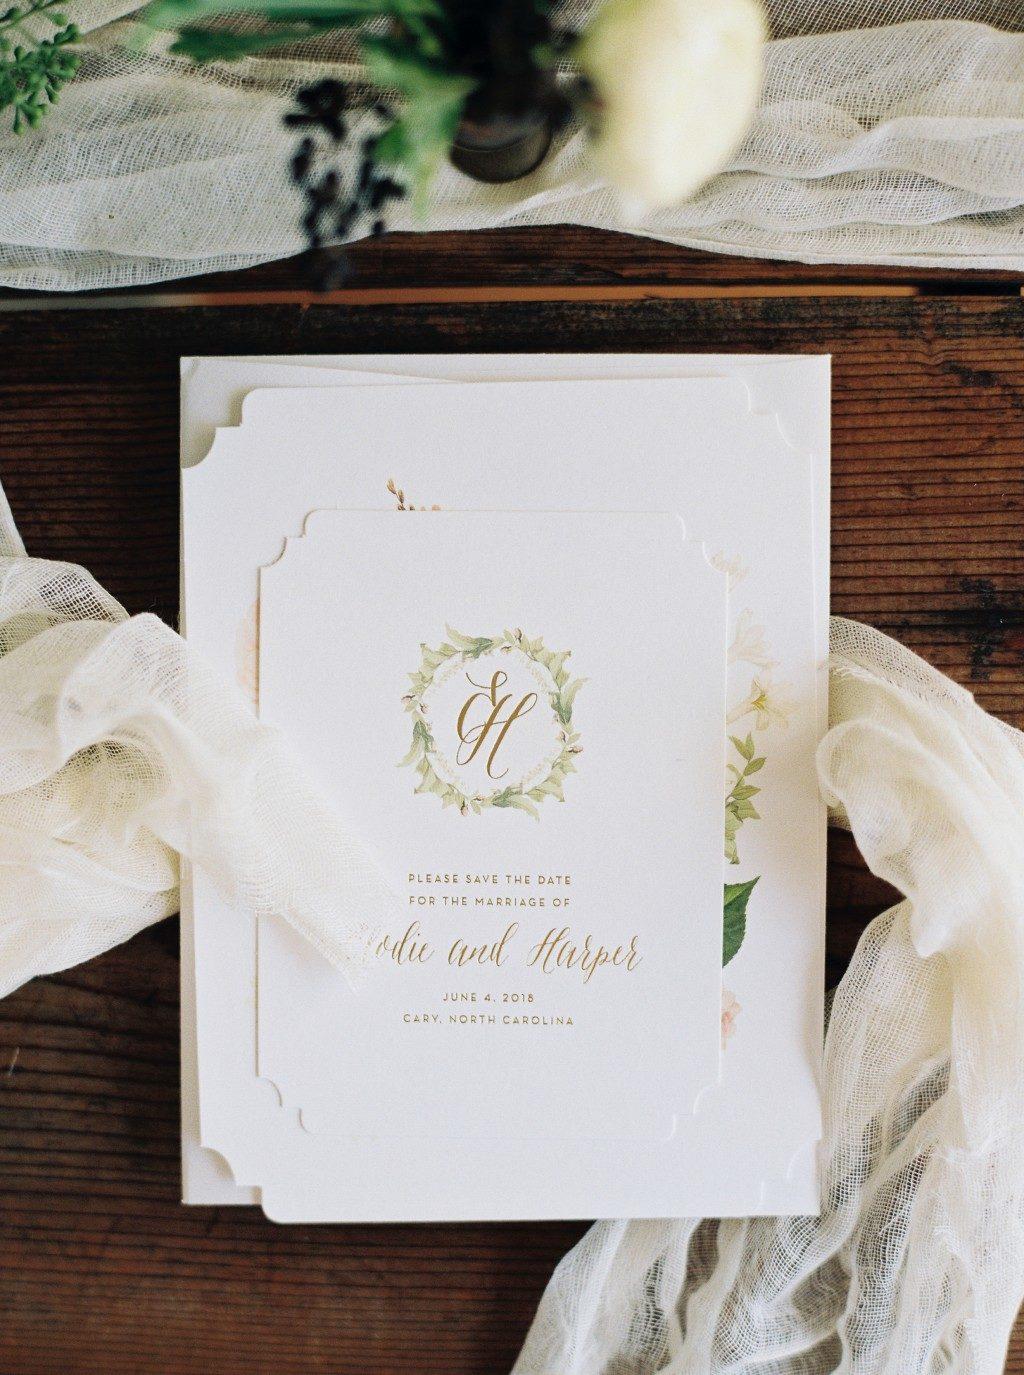 Josephine wedding invitations from Bella Figura